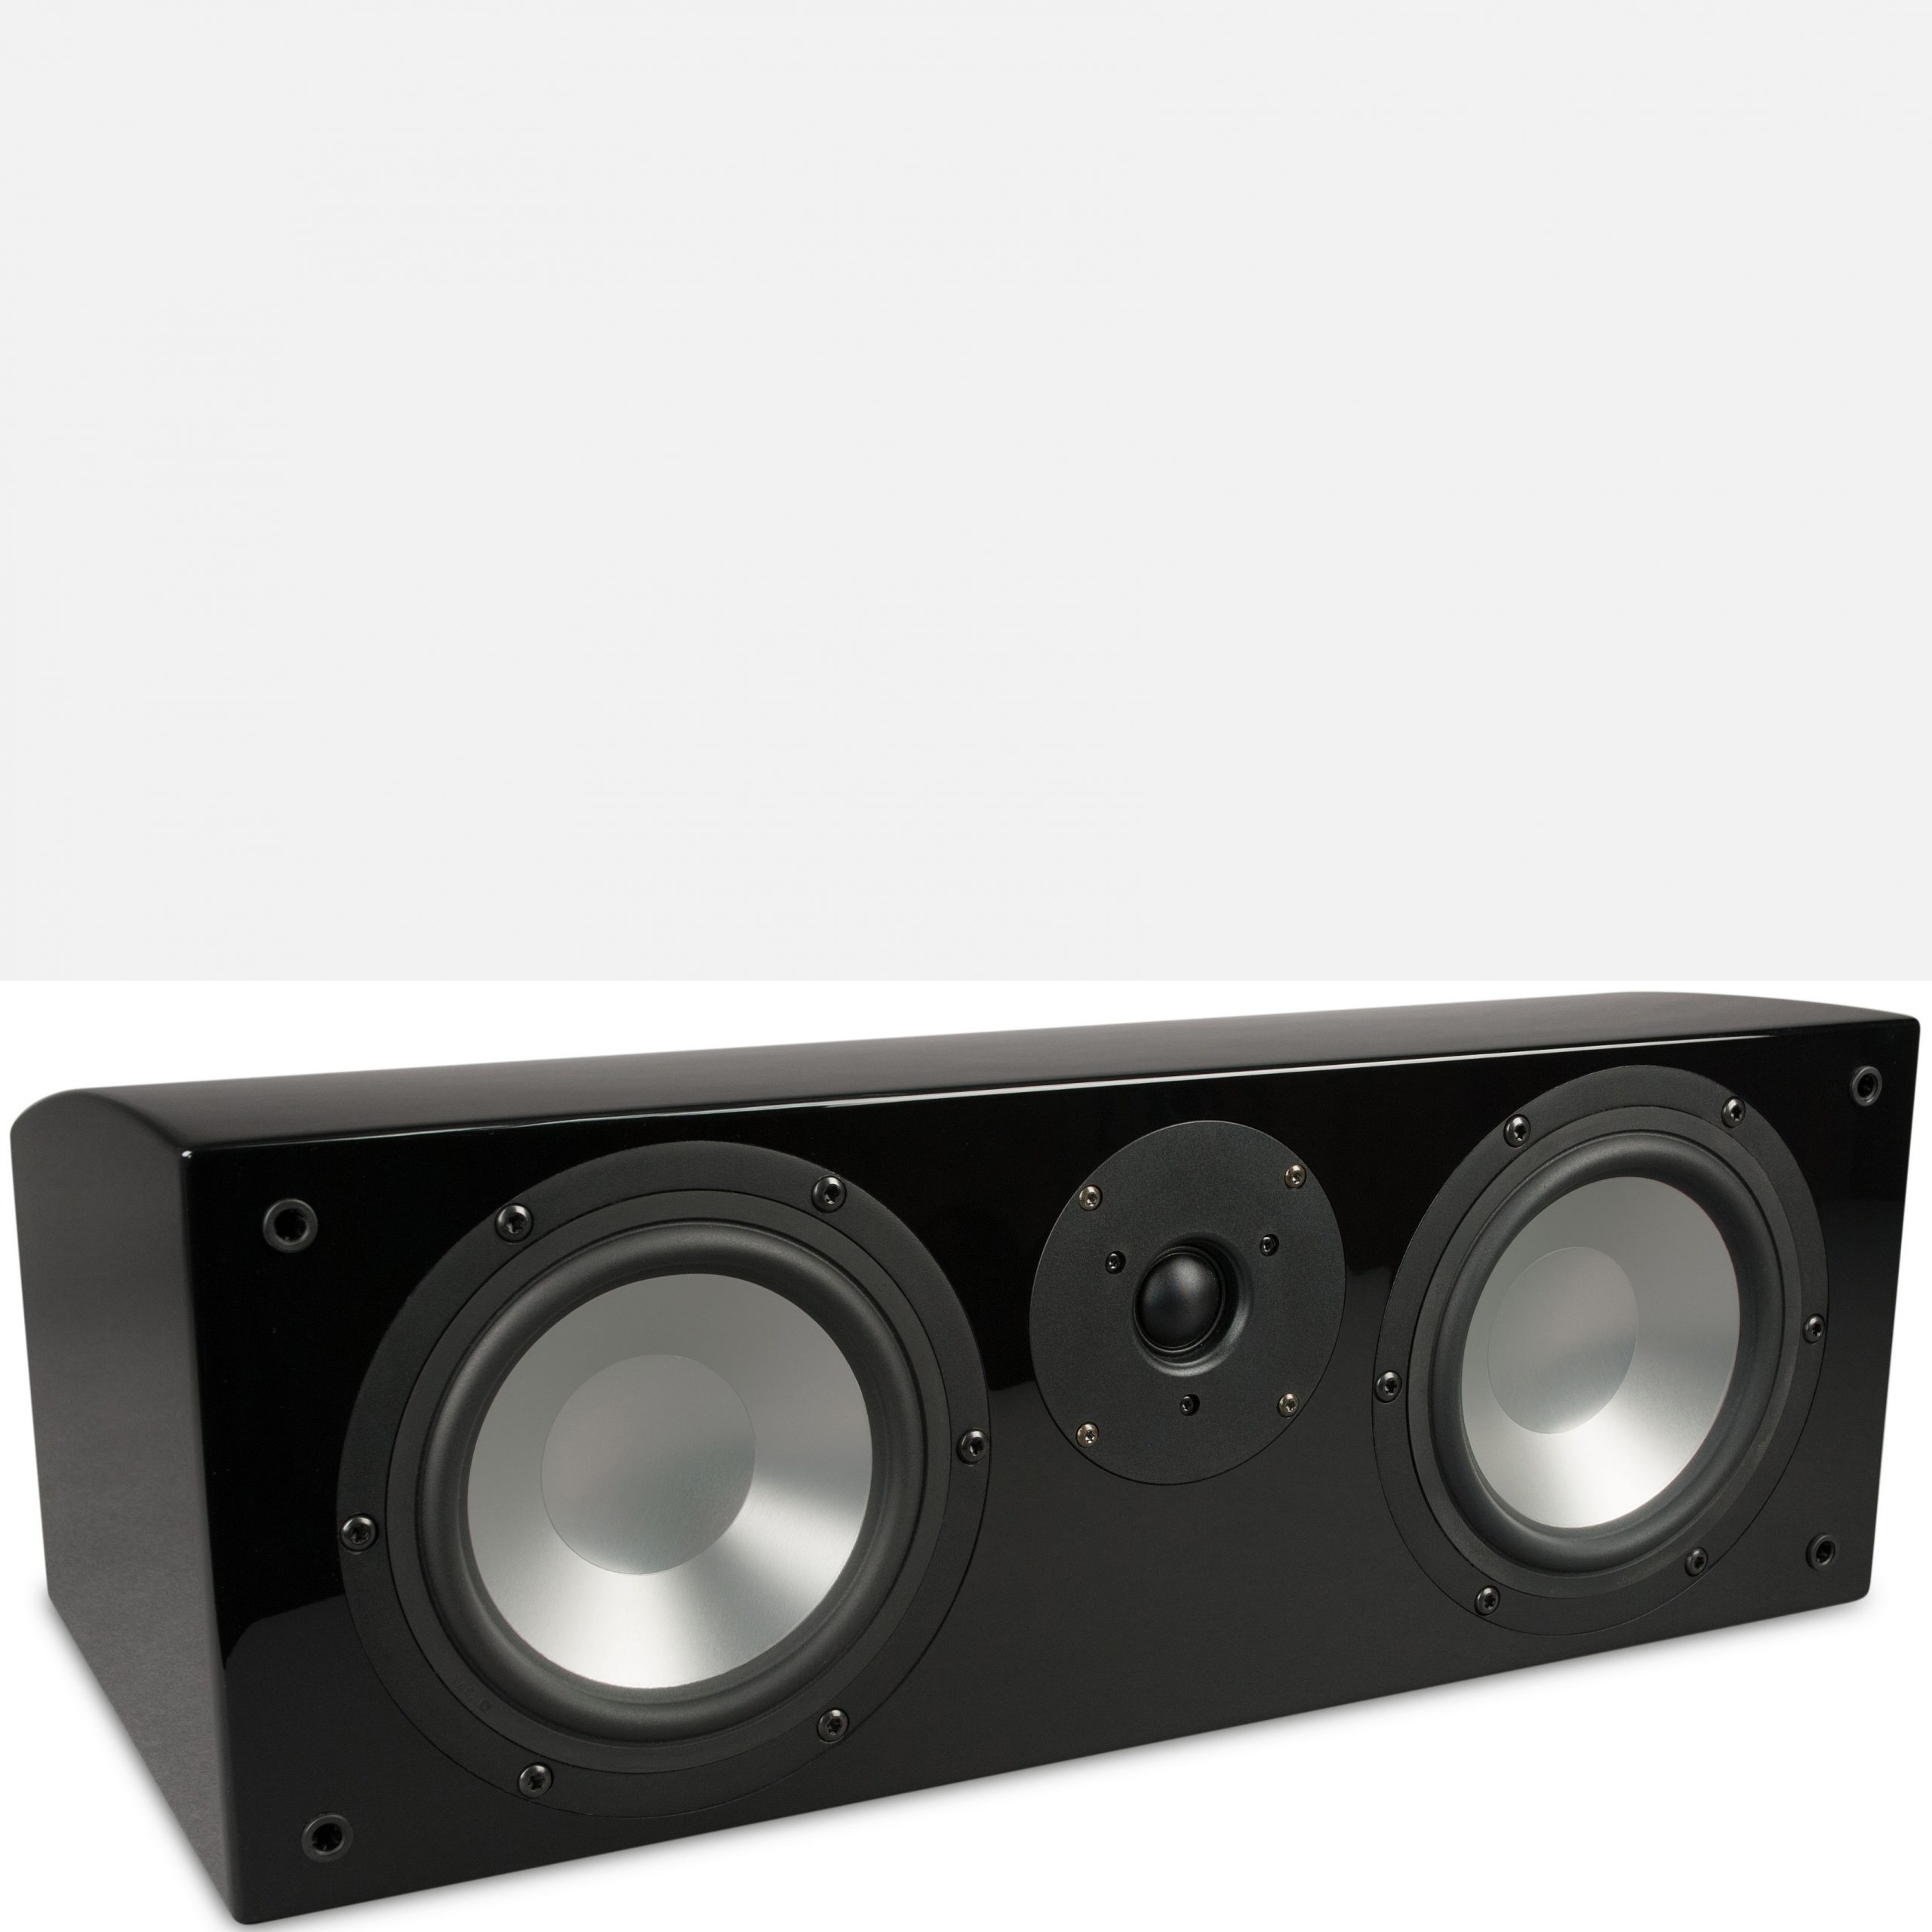 RBH Signature SV Series SV-661C Centre Channel Speaker